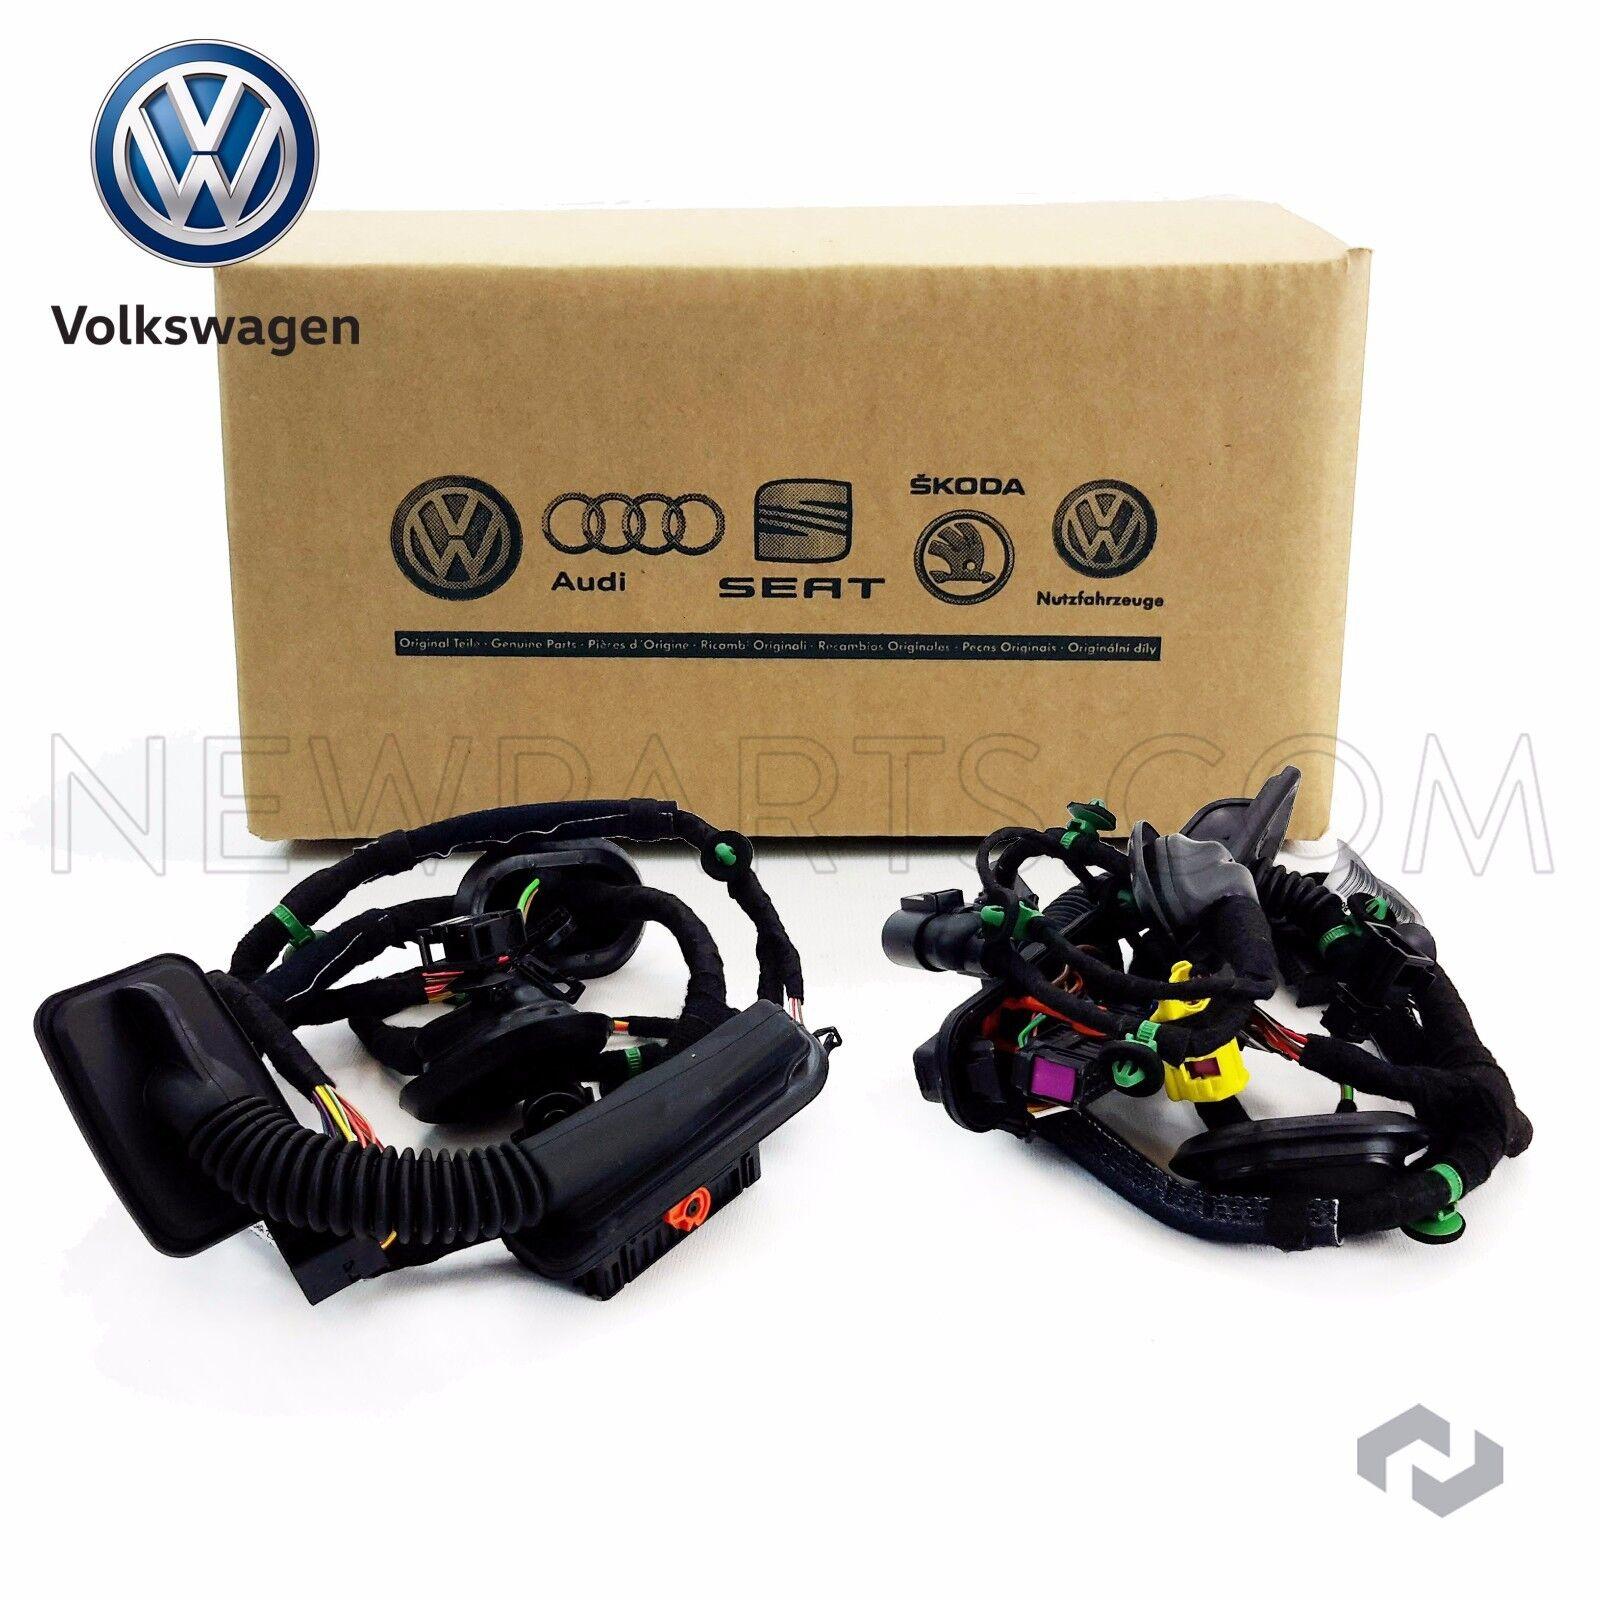 Genuine Volkswagen Drivers Side Door Harness 1k5971120h Ebay 2014 Vw Jetta Wire Norton Secured Powered By Verisign